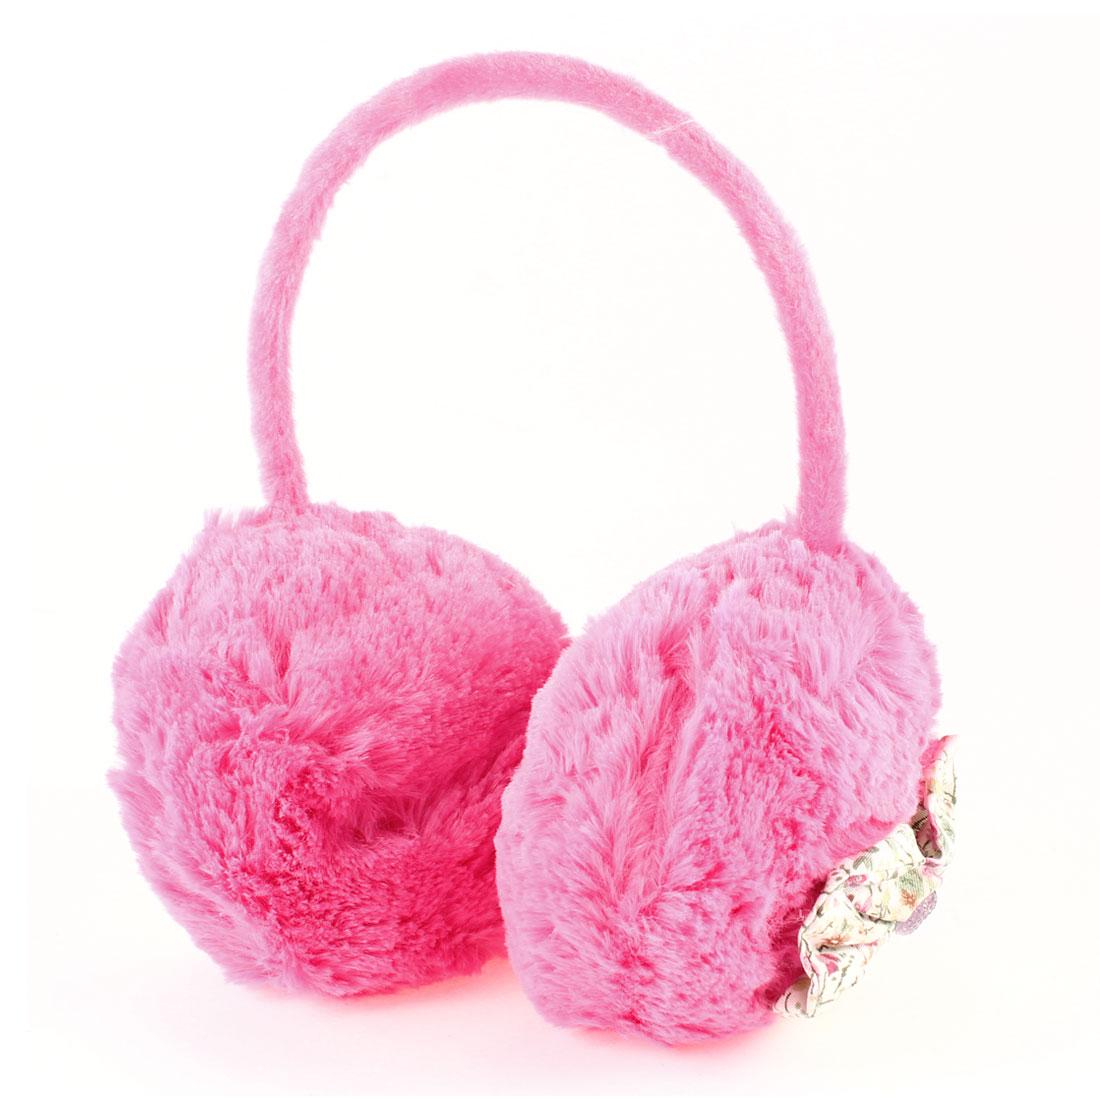 Girls Fuchsia Plush Bowtie Decor Ear Warmer Winter Earmuffs